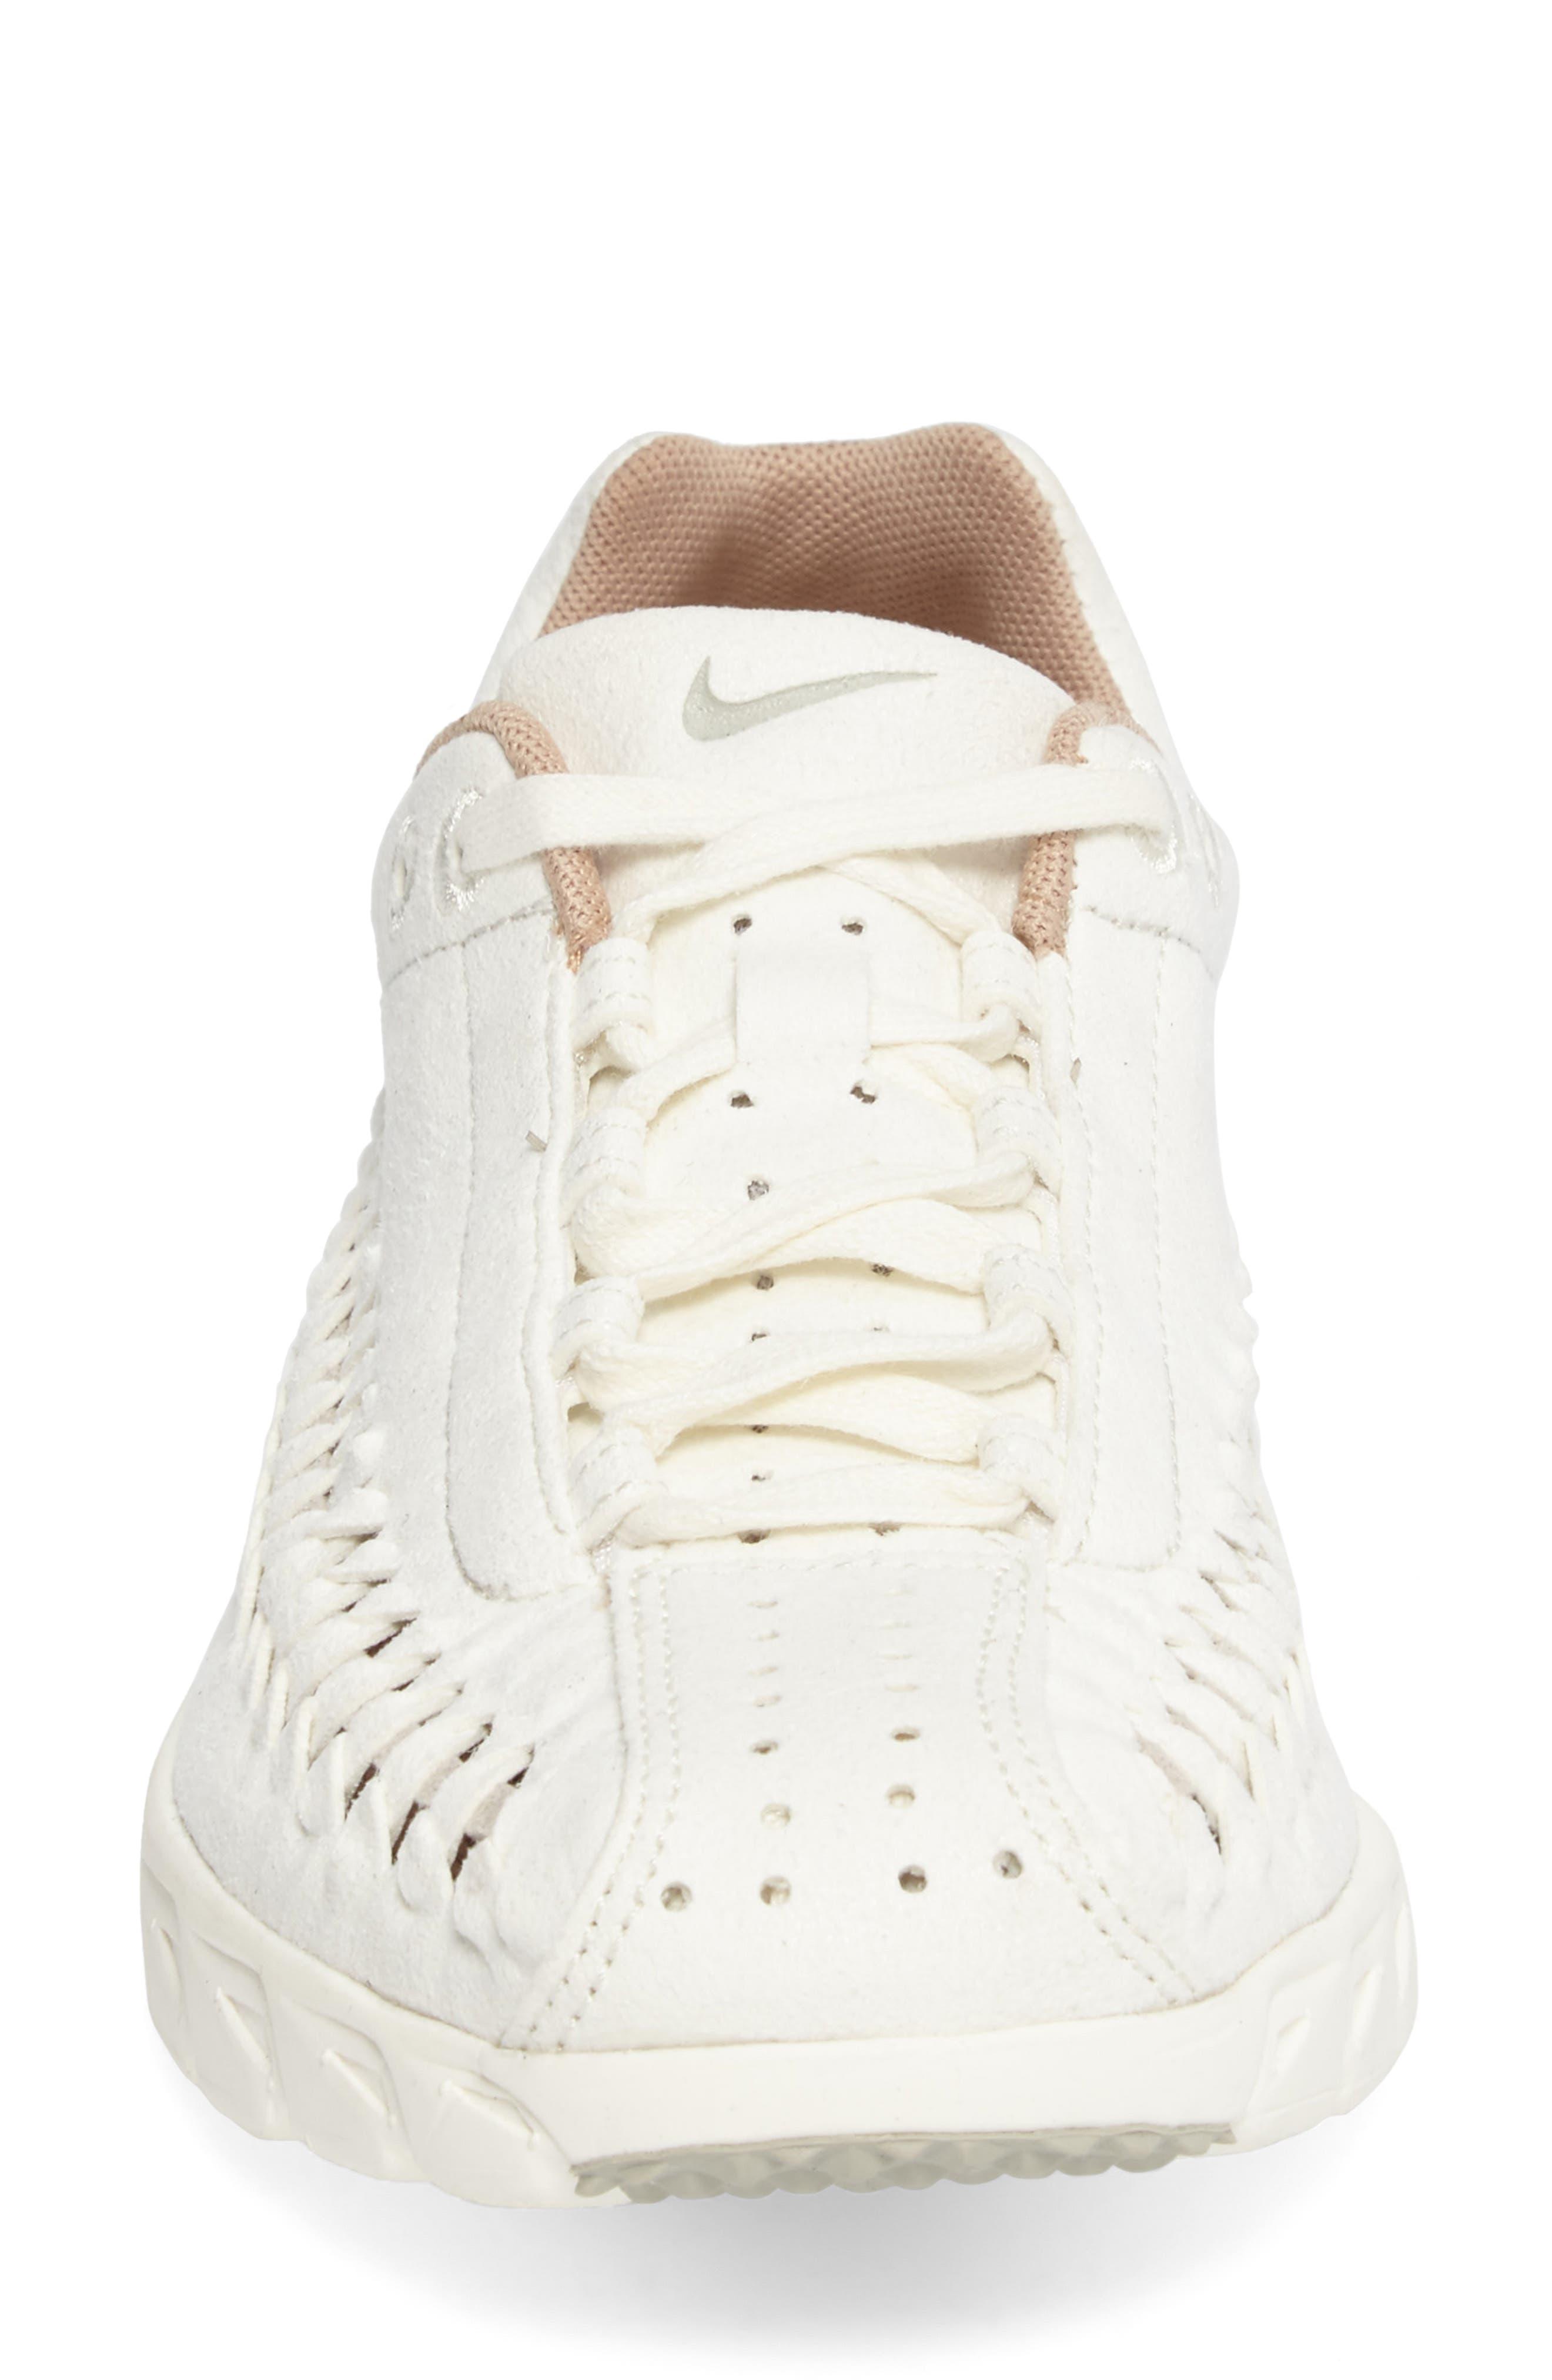 'Mayfly Woven' Sneaker,                             Alternate thumbnail 4, color,                             Sail/ Pale Grey/ Elm/ Sail